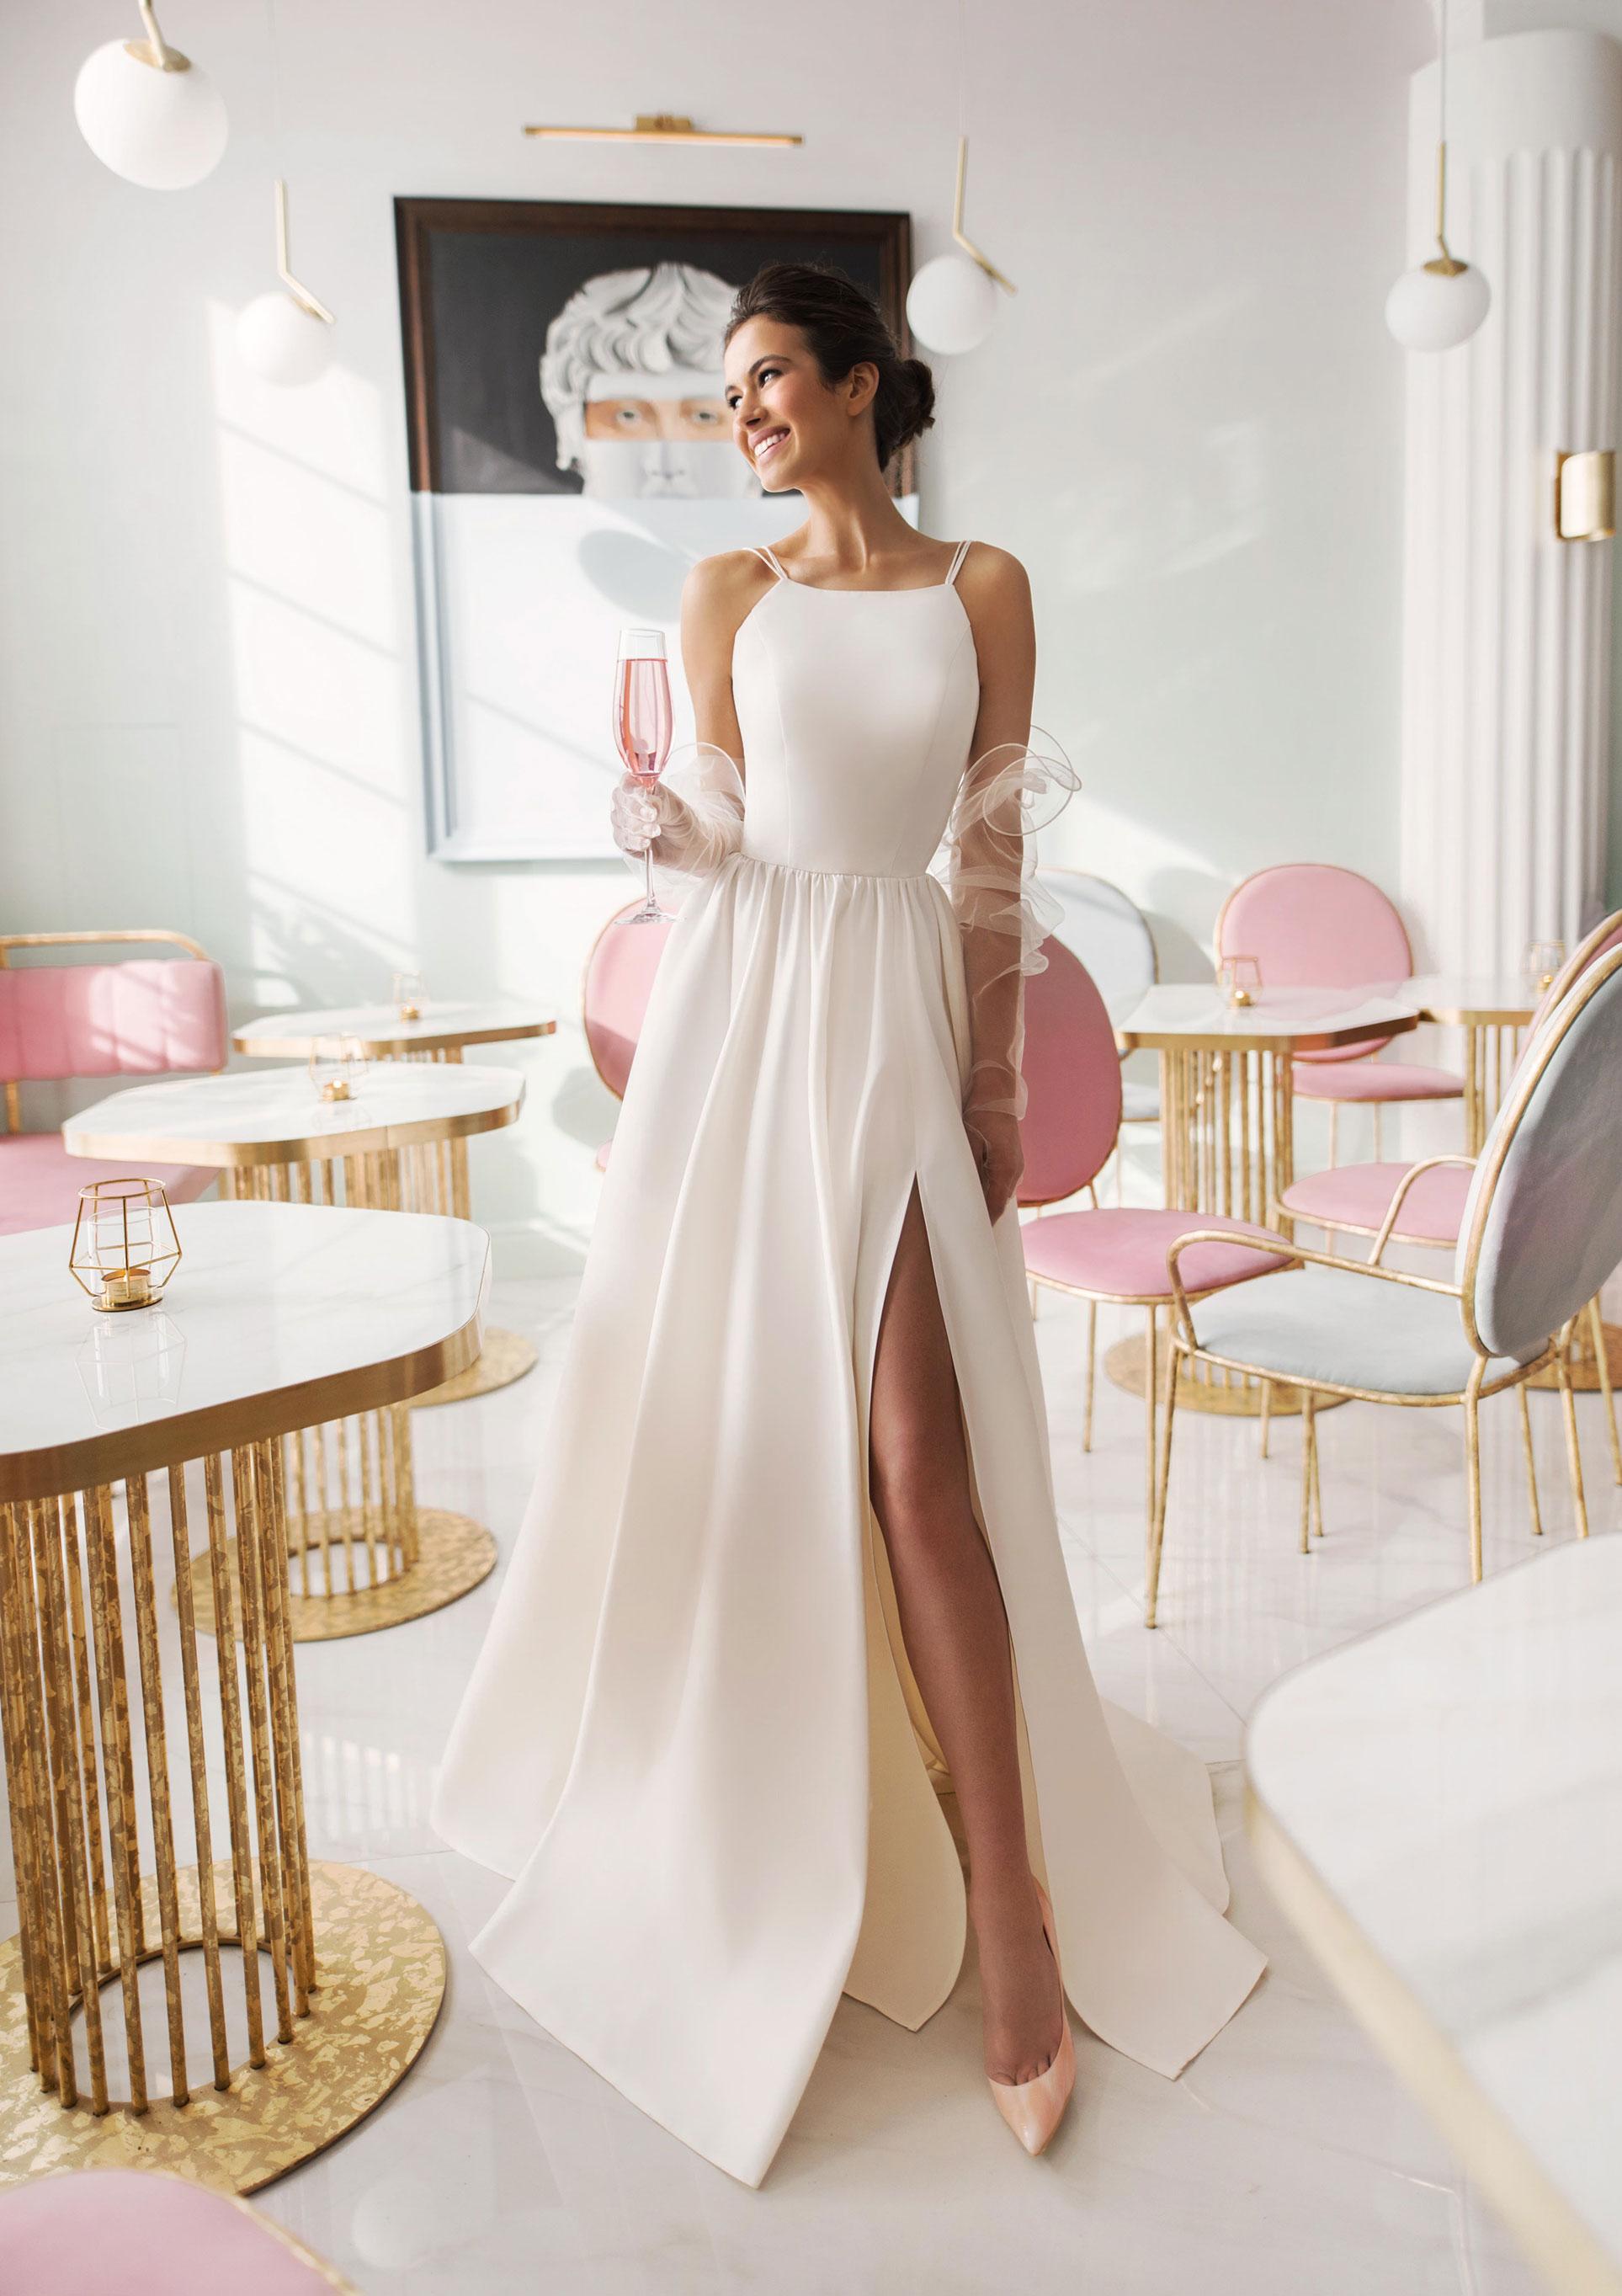 Ксения Саладуха в свадебных нарядах Ave Wedding, весна-лето 2019 / фото 07